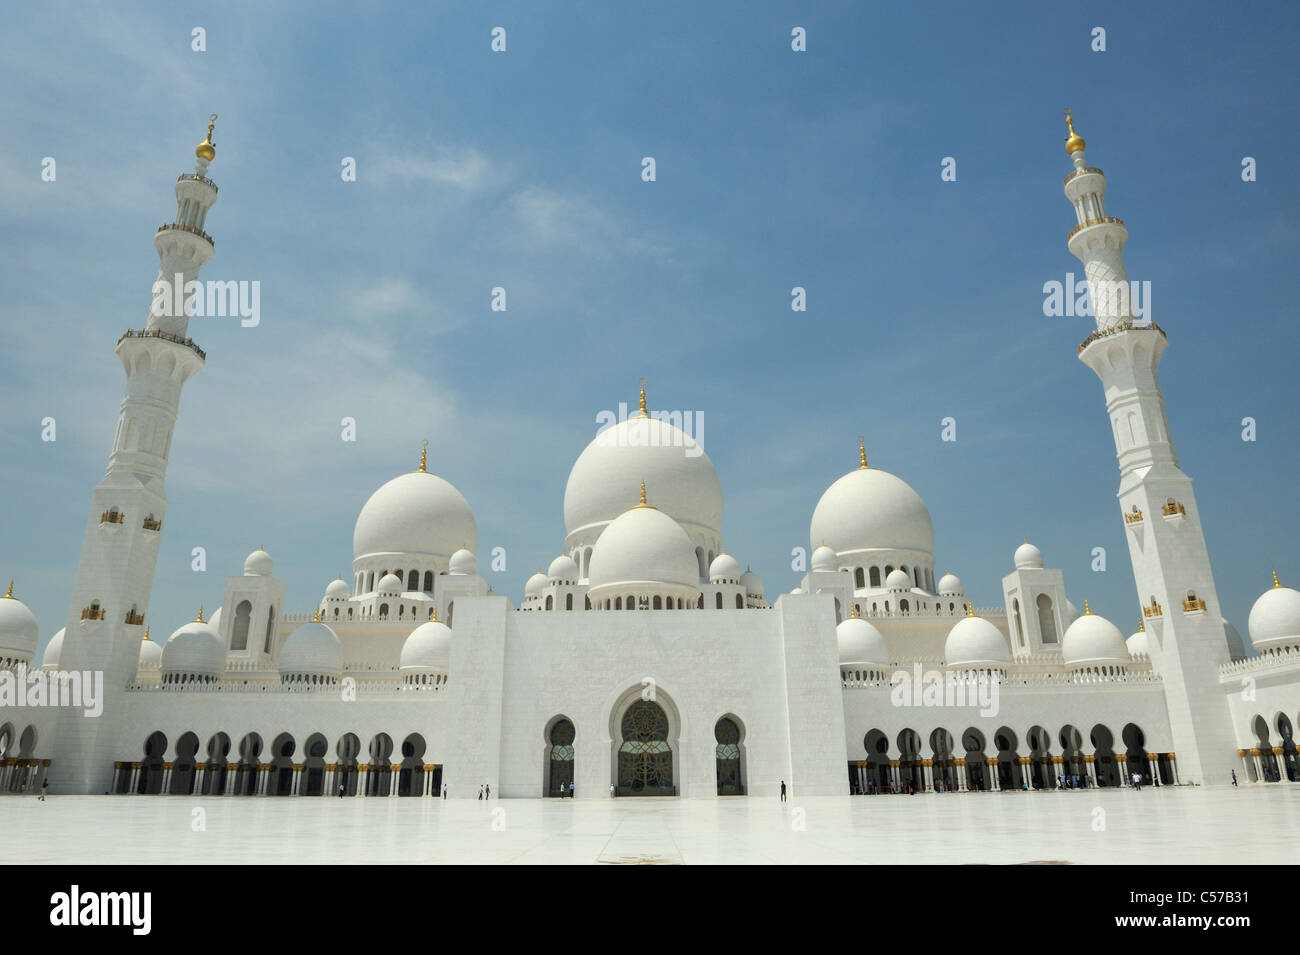 Abu Dhabi Grand Mosque Stock Photo